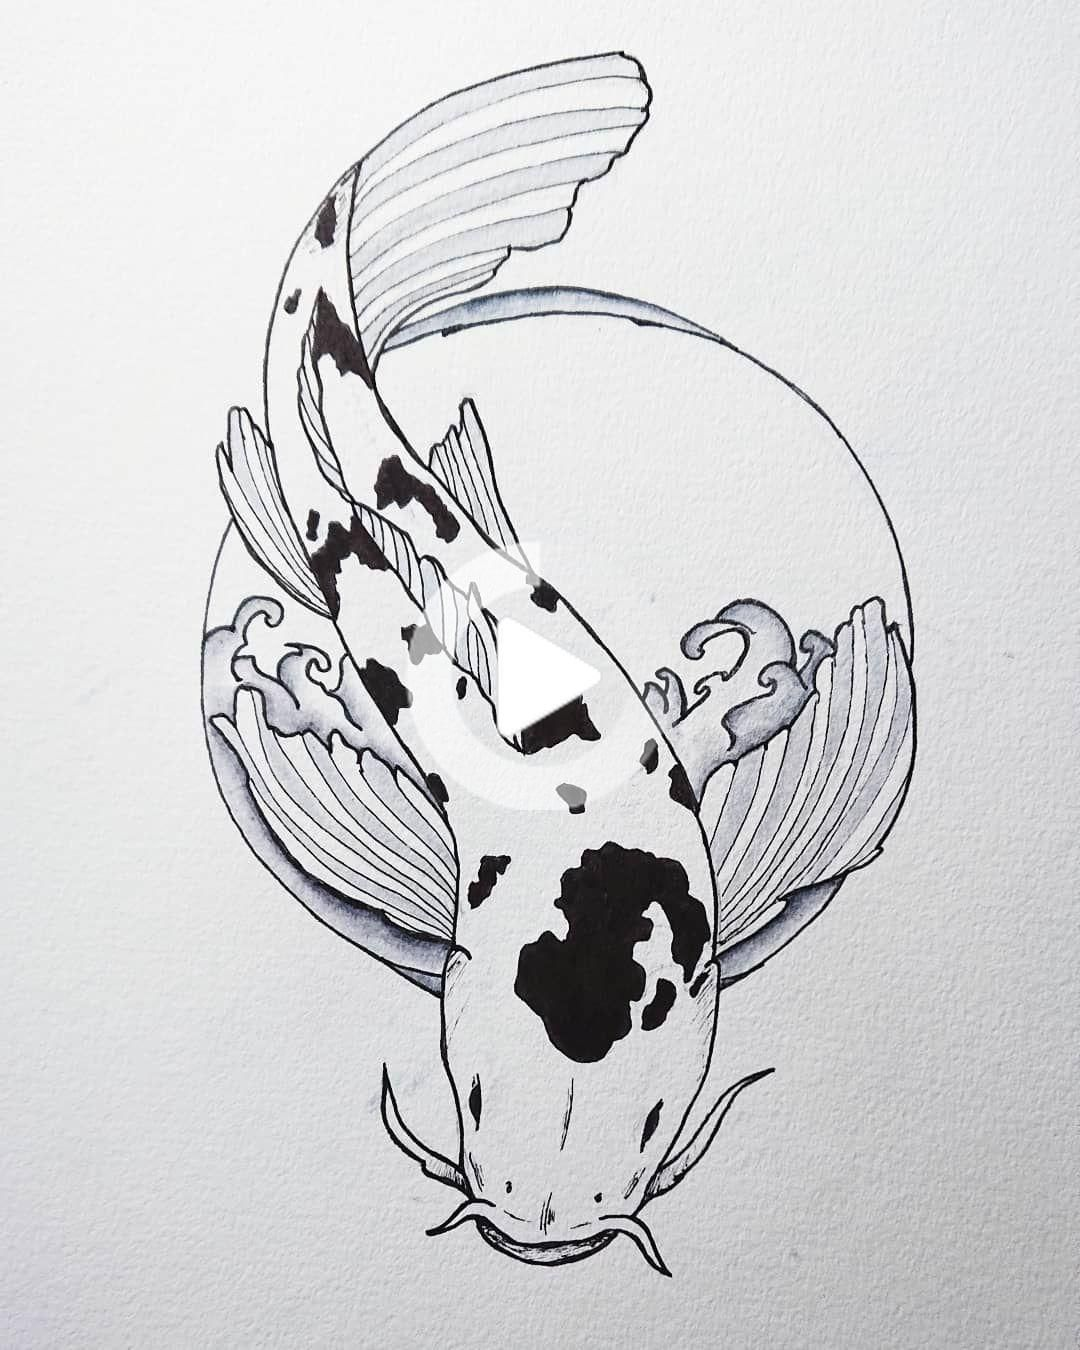 Un d'une simple et agréable pour finir ce mois-ci. . #art #artist #pen #ink #tattoo #irezumi #Japan #linework #koi #fish #water #style #progress #drawing #draw #artwork #Japanese #illustration #inkart #blackandwhite #graphic #Design #inked #tattooed #concept #linework #asia #Toronto #Niagara #flower #artifection @ artifection.ink #dessindetatouage